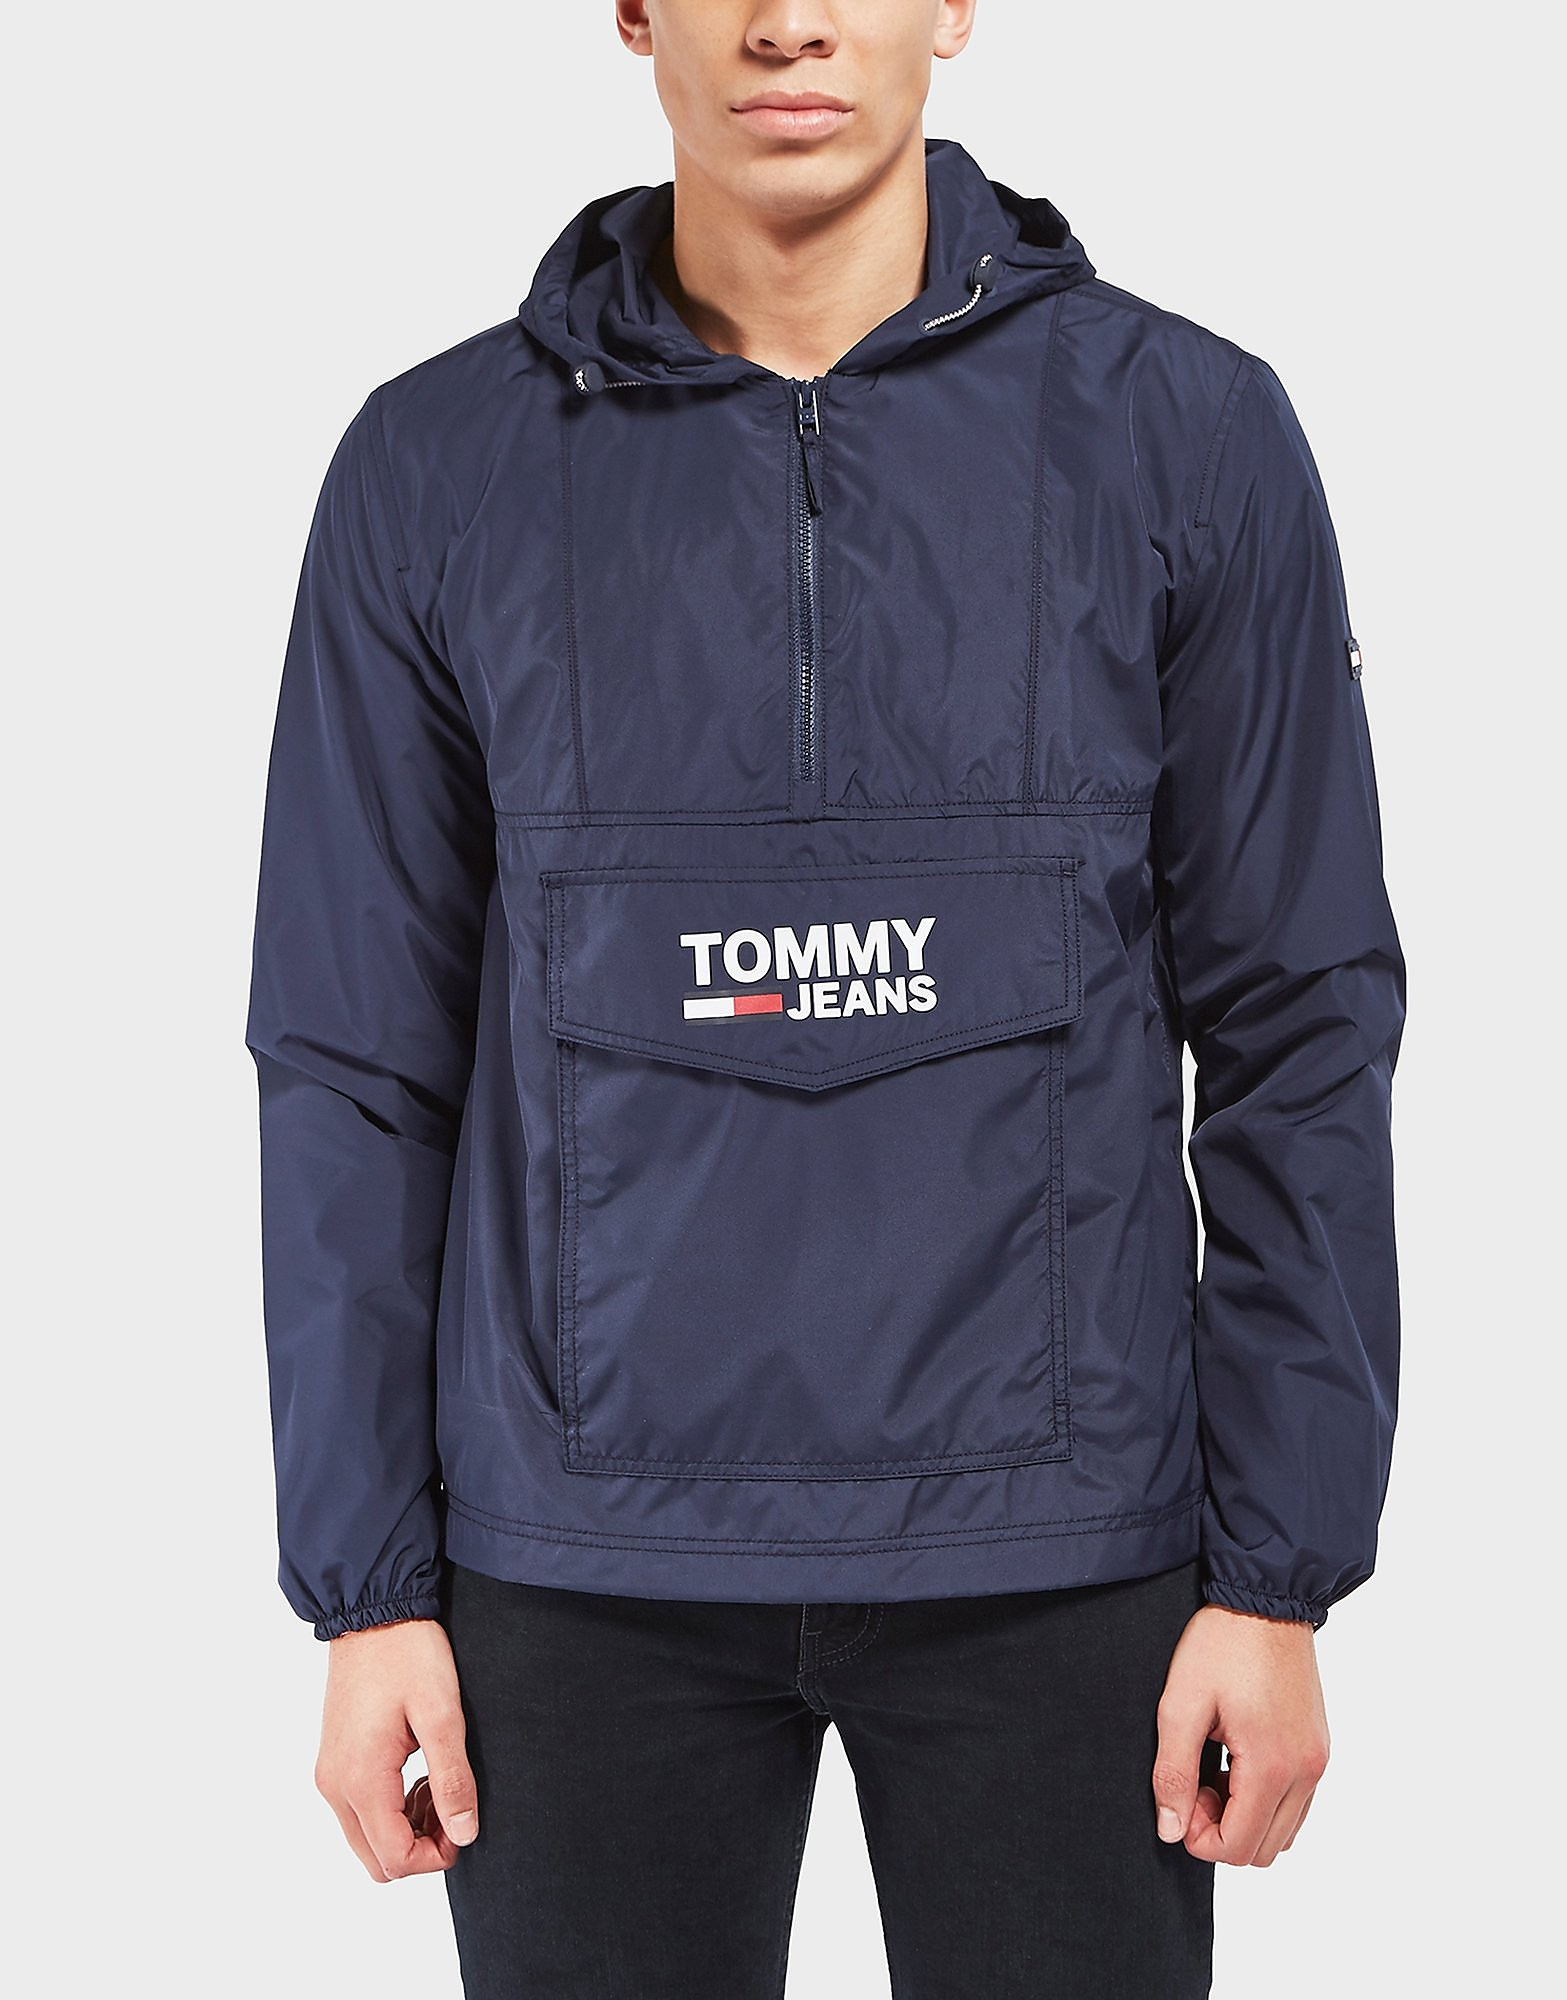 Tommy Hilfiger Overhead Lightweight Anorak  Navy Navy